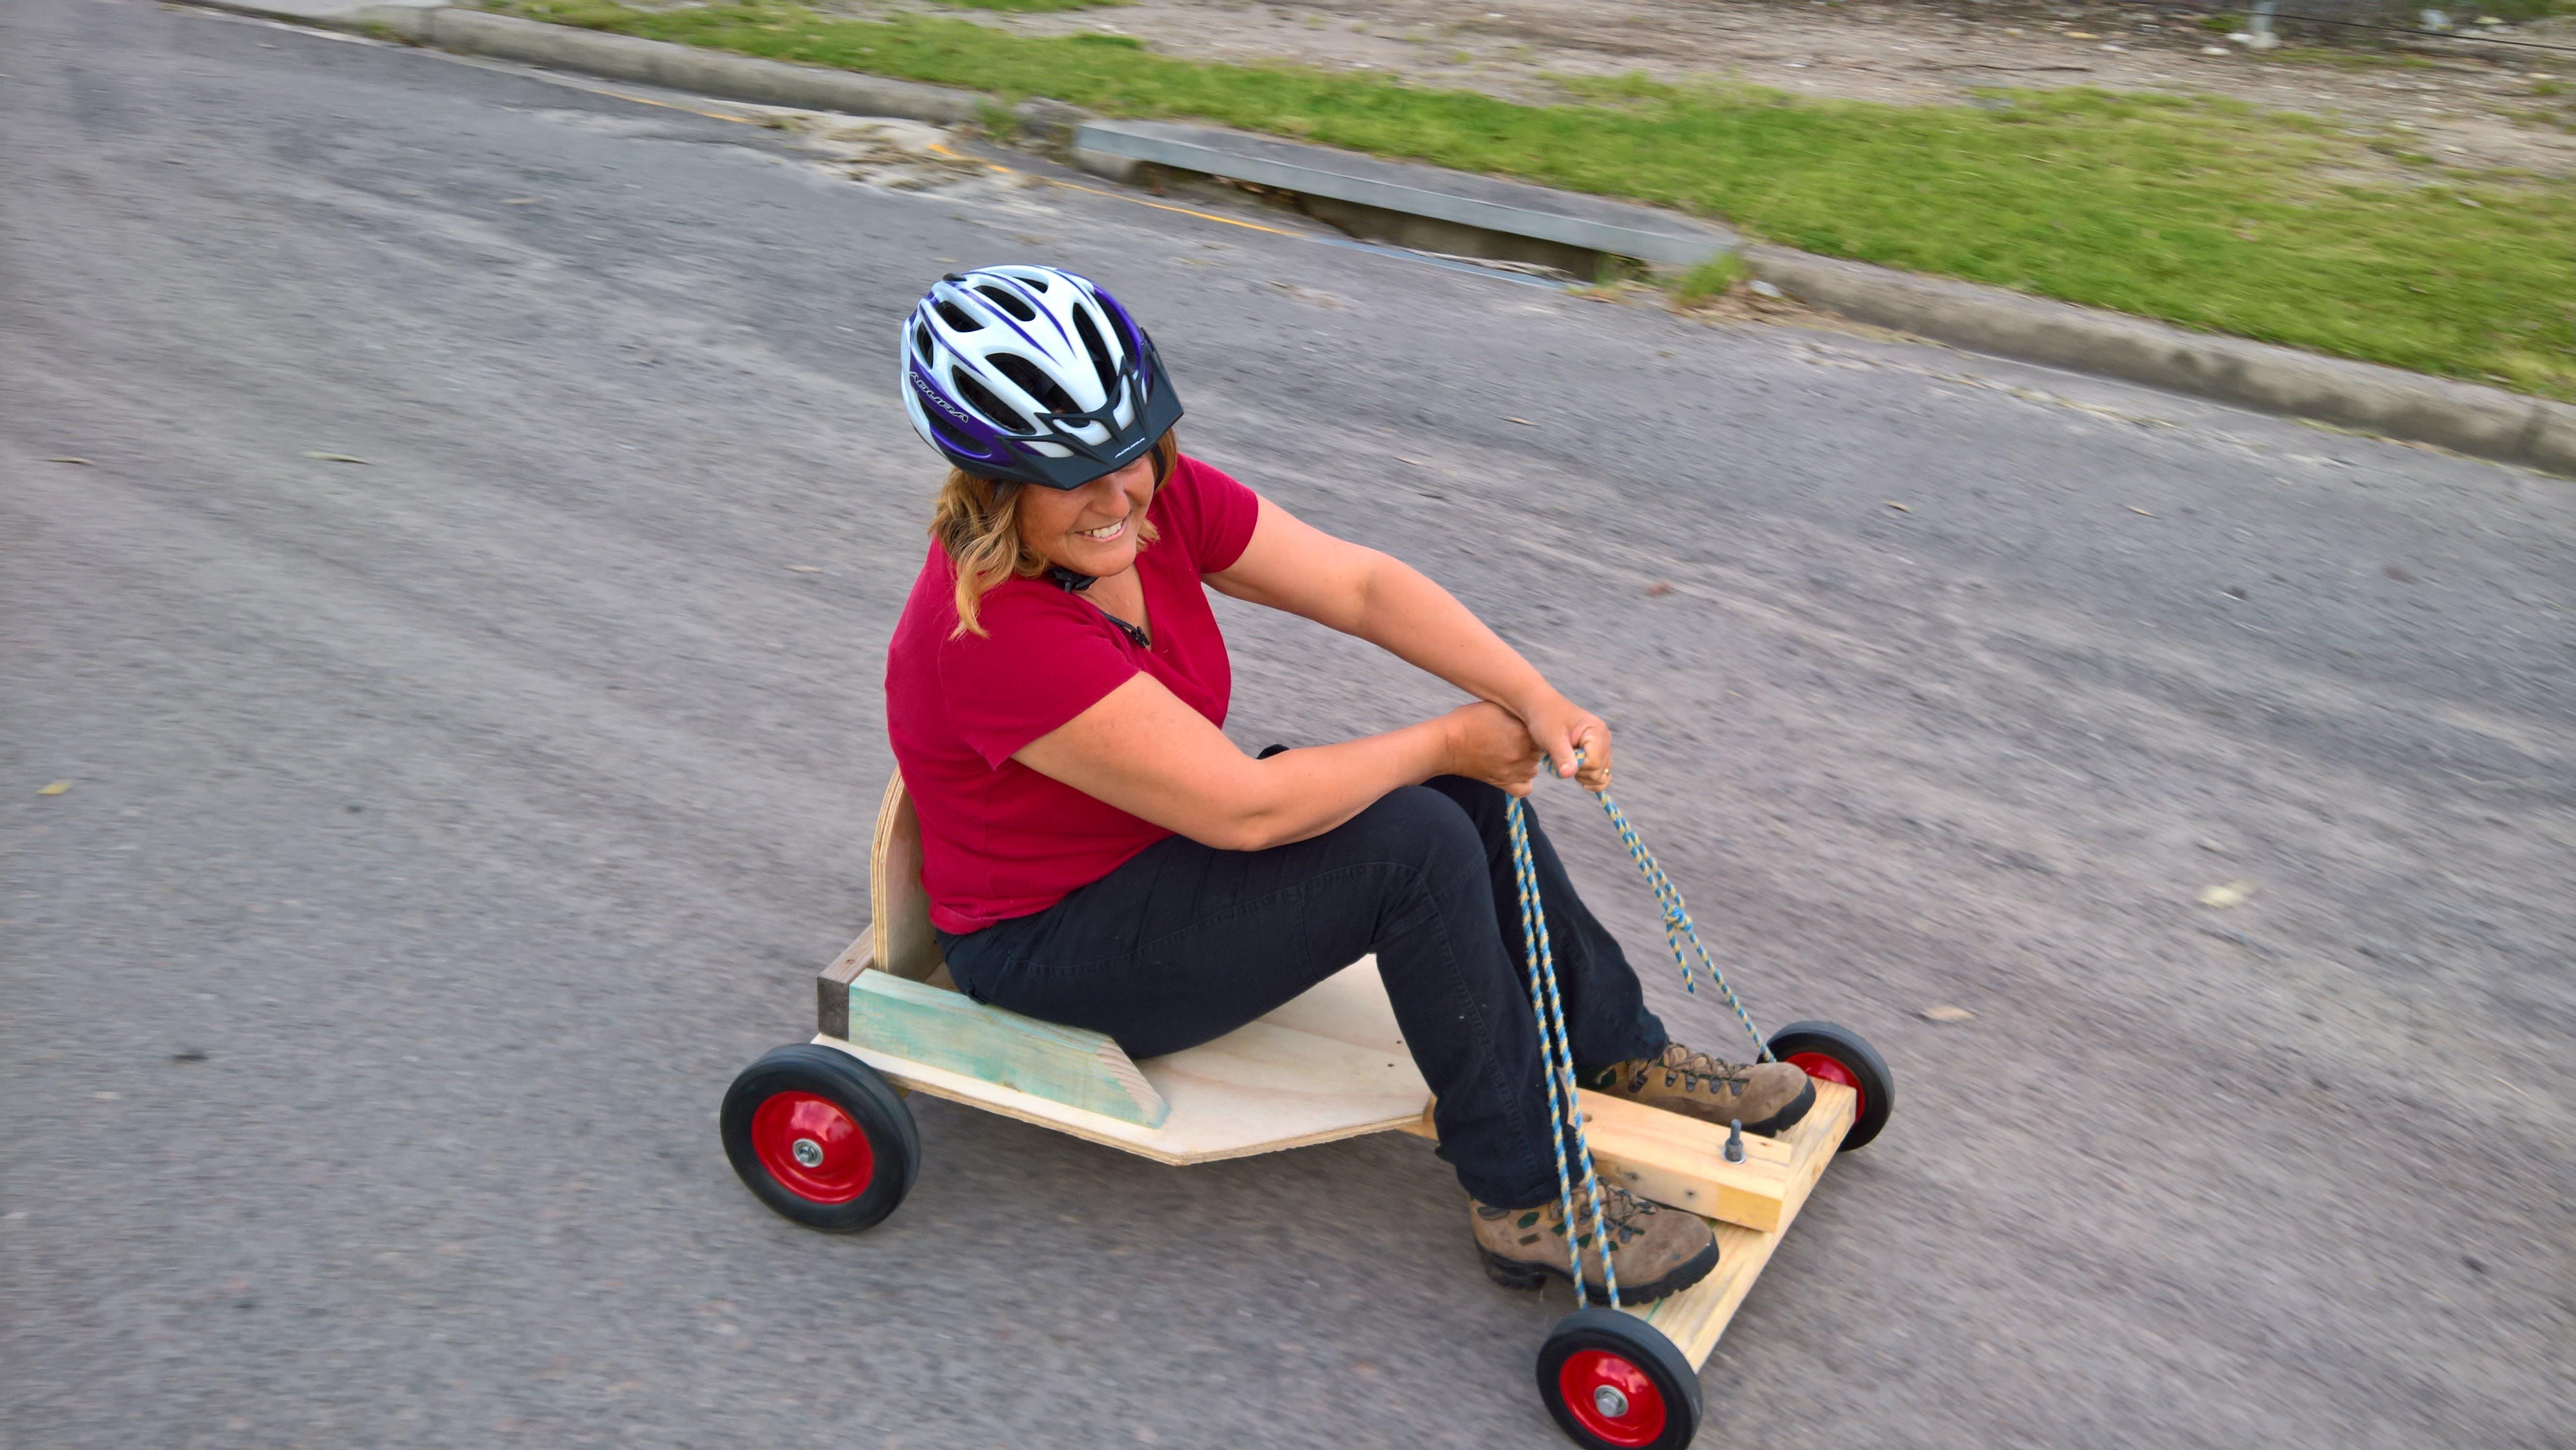 Free stock photo of billy cart, having fun